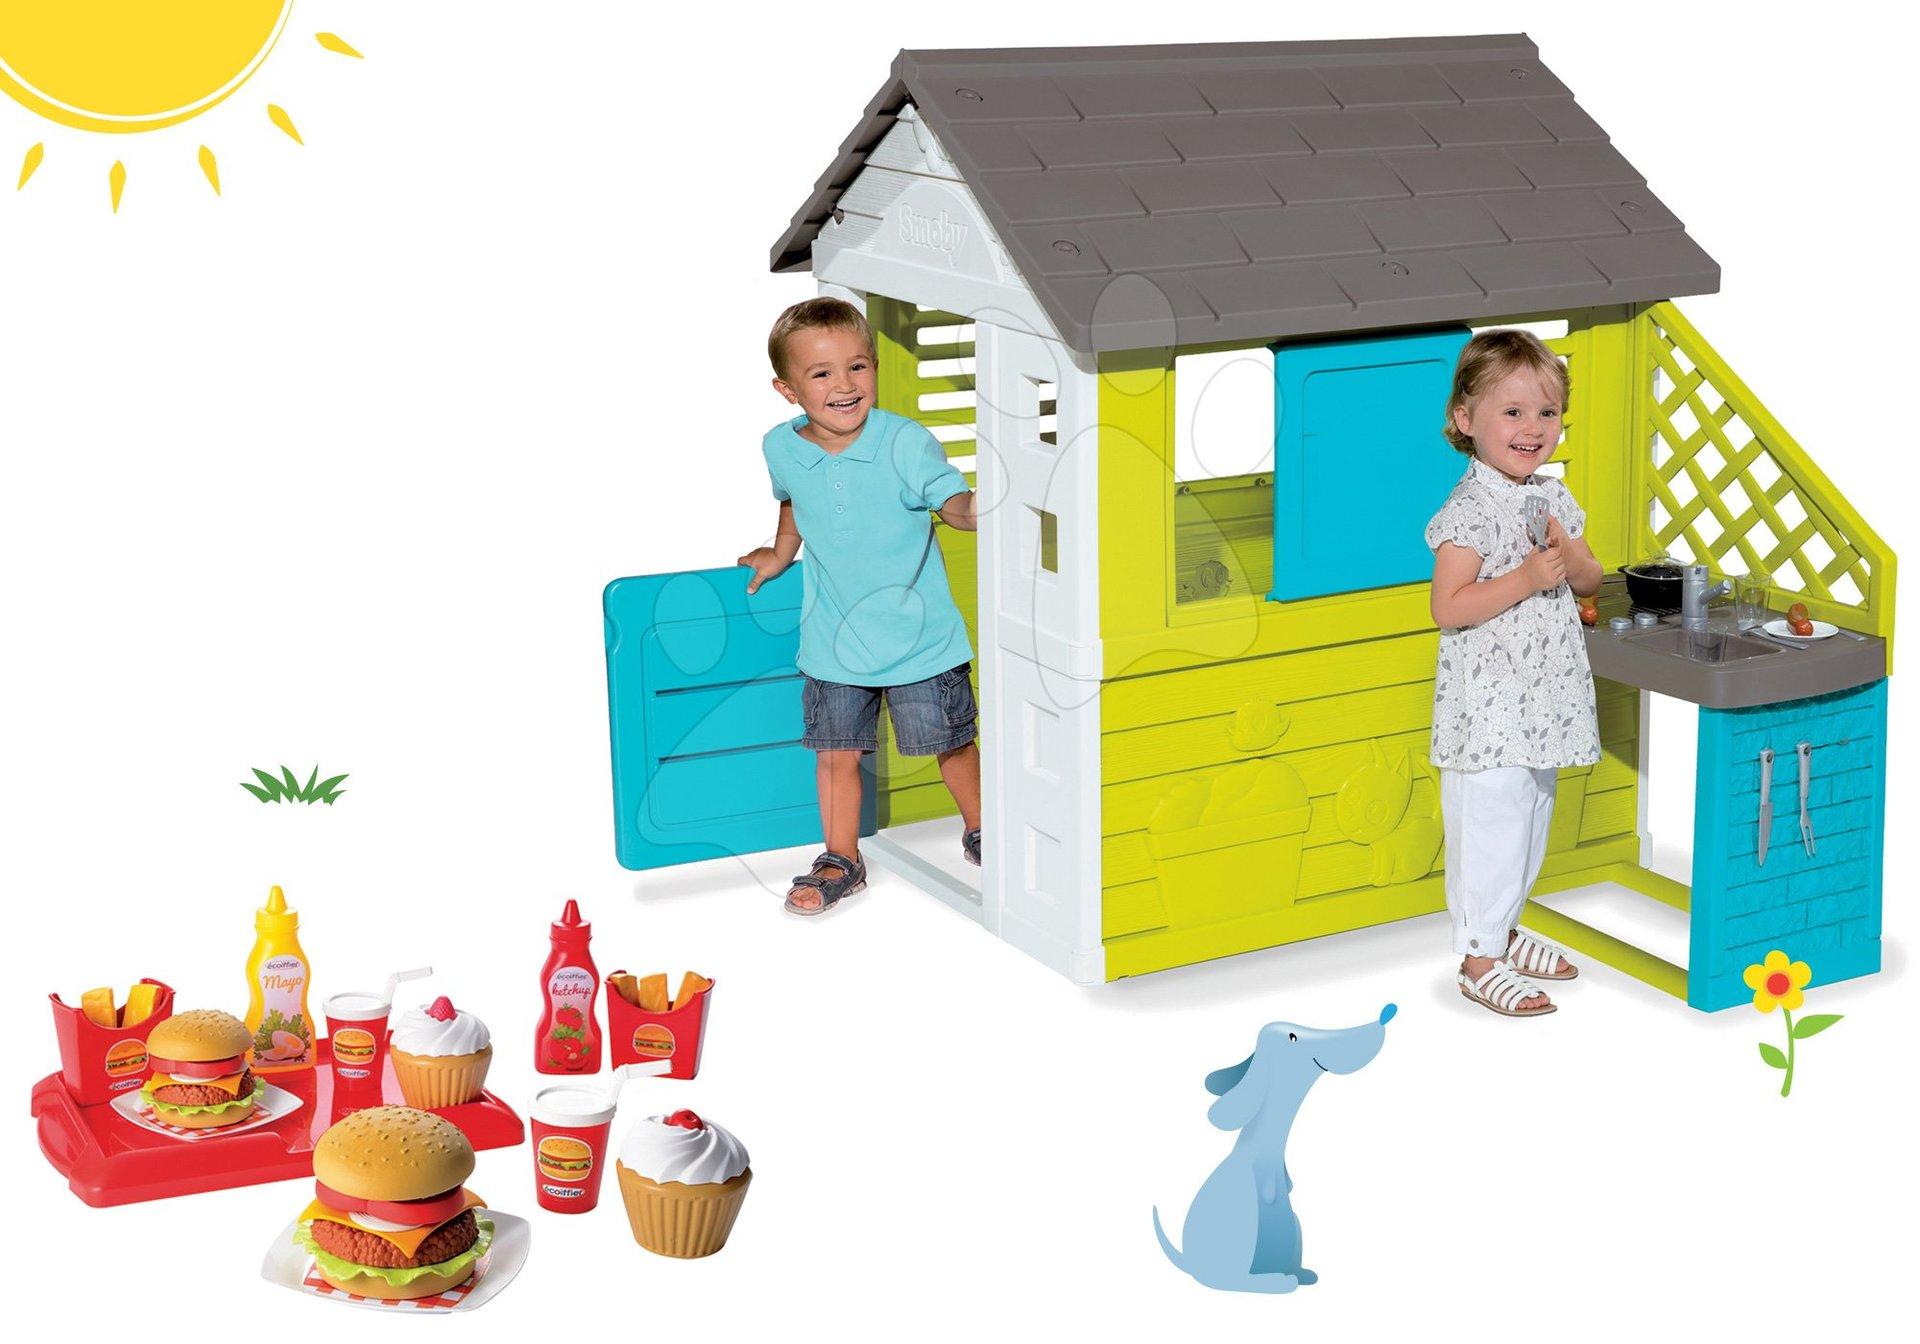 Smoby set detský domček Pretty Blue s letnou kuchynkou a hamburger s kečupom a doplnkami 810703-39